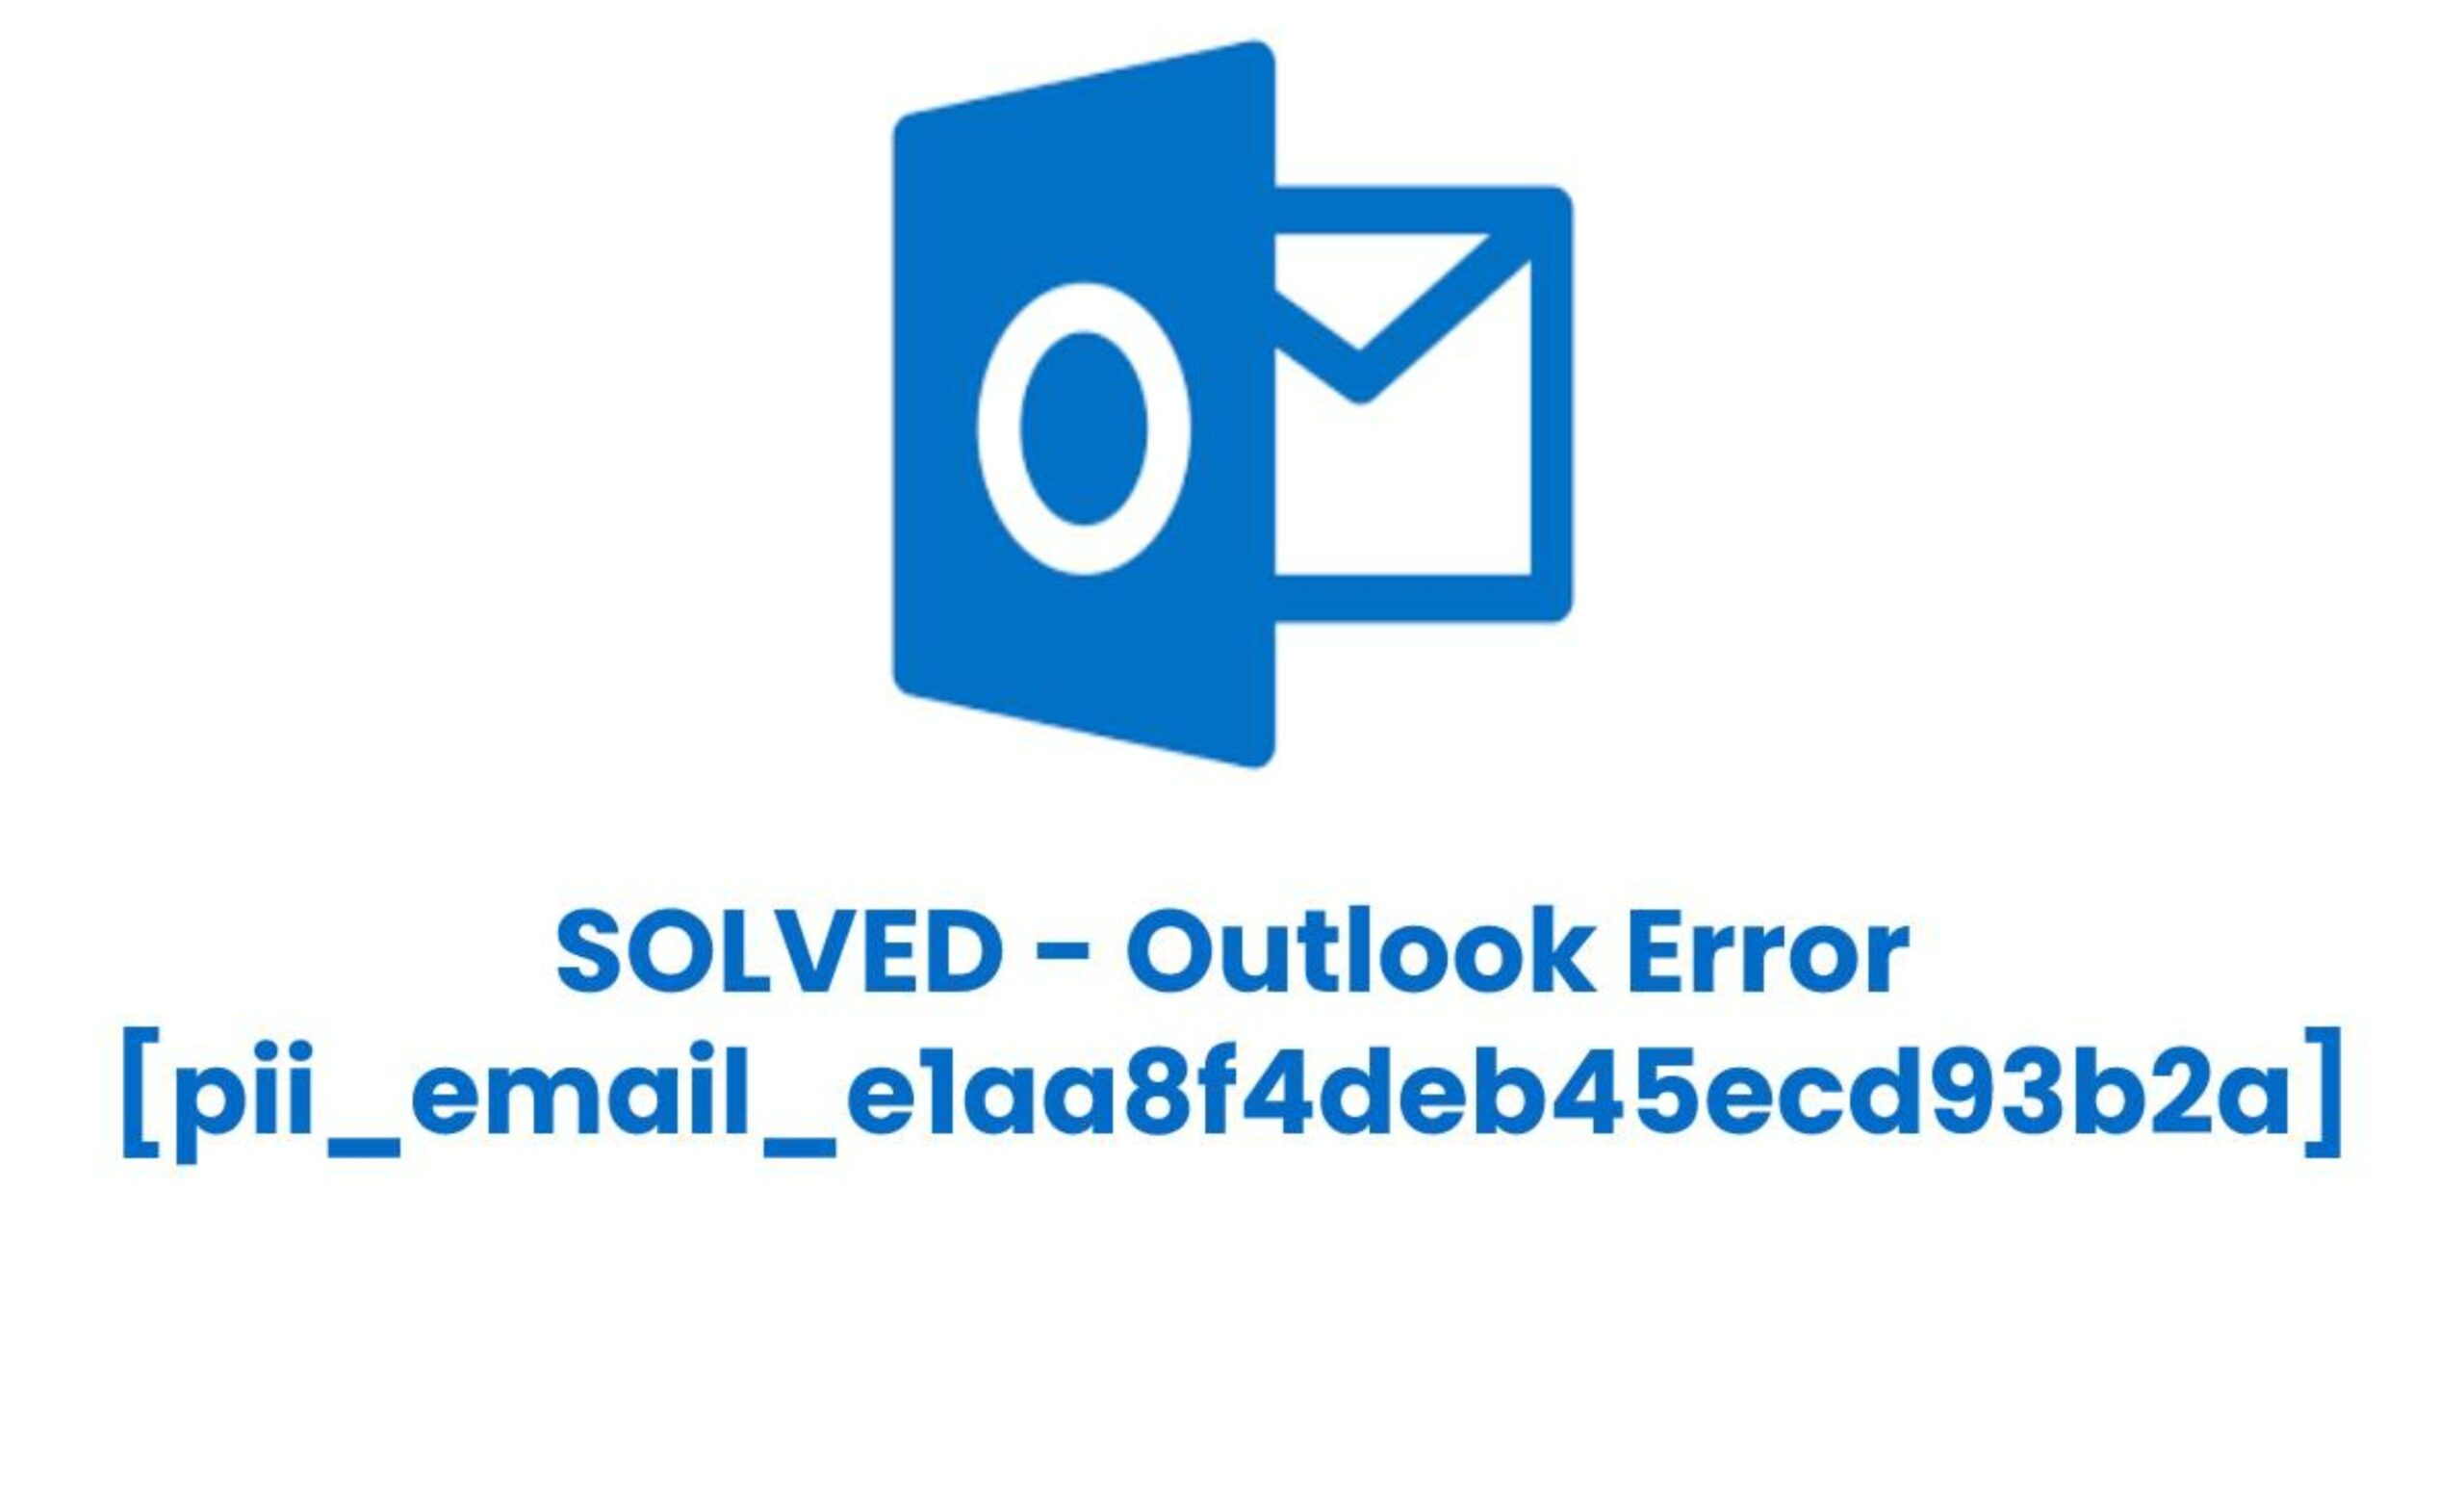 Fix outlook error [pii_email_e1aa8f4deb45ecd93b2a]